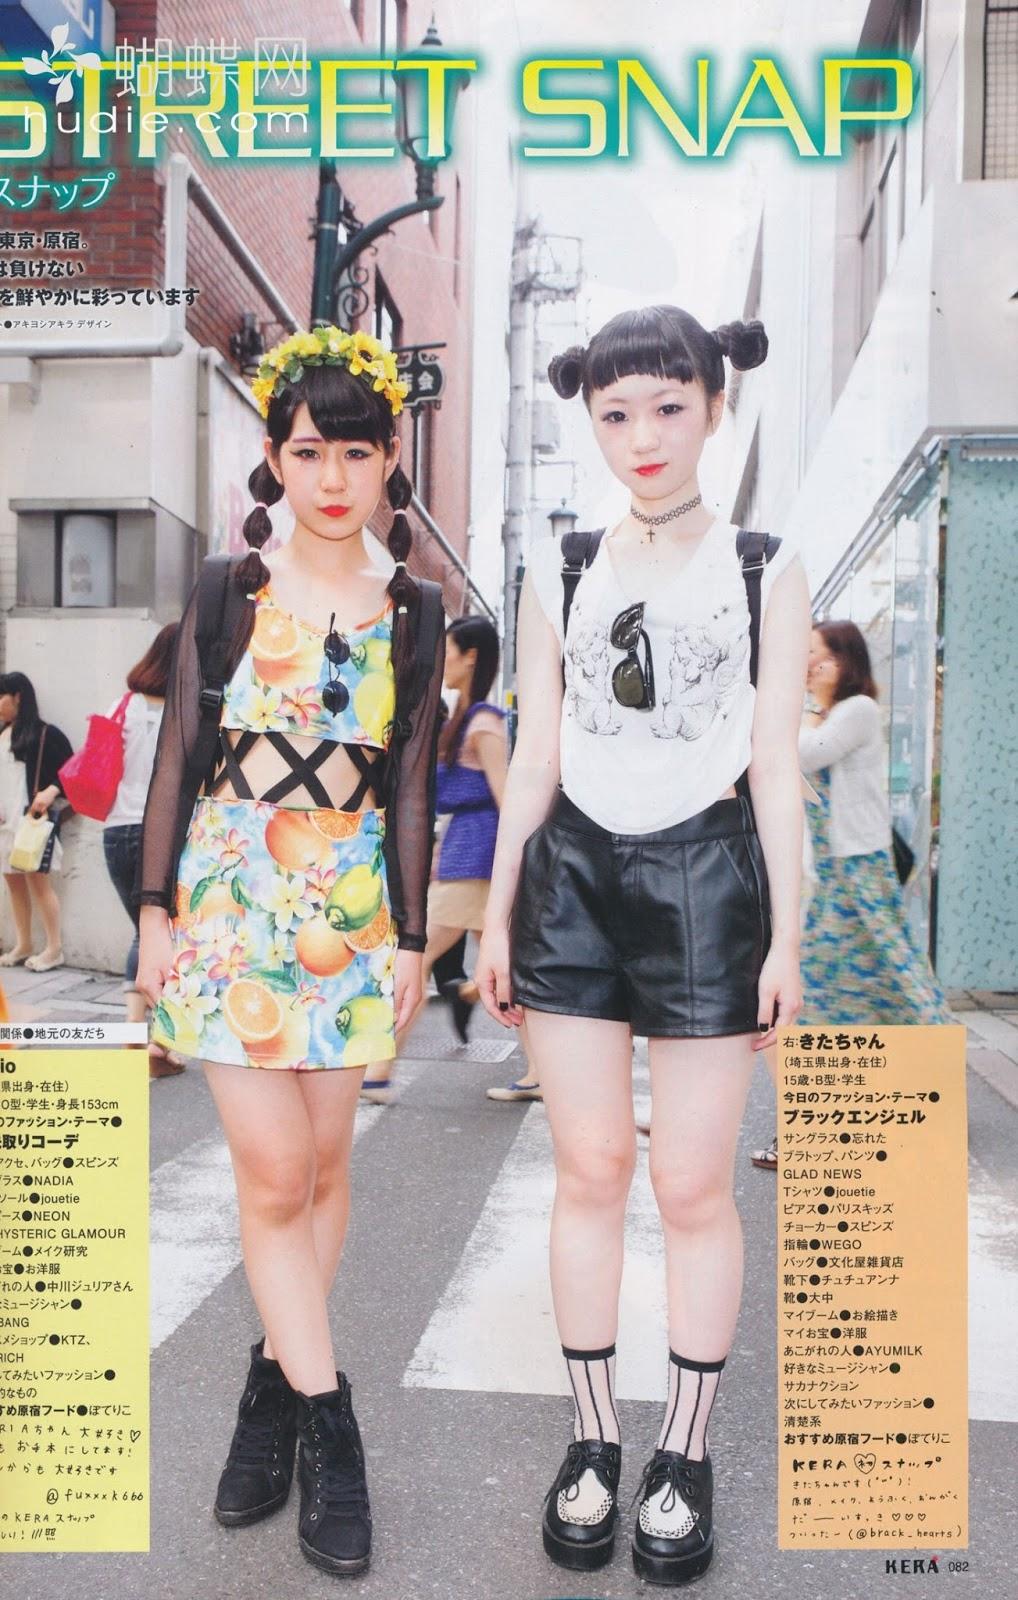 Kera Magazine Harajuku Street Snaps